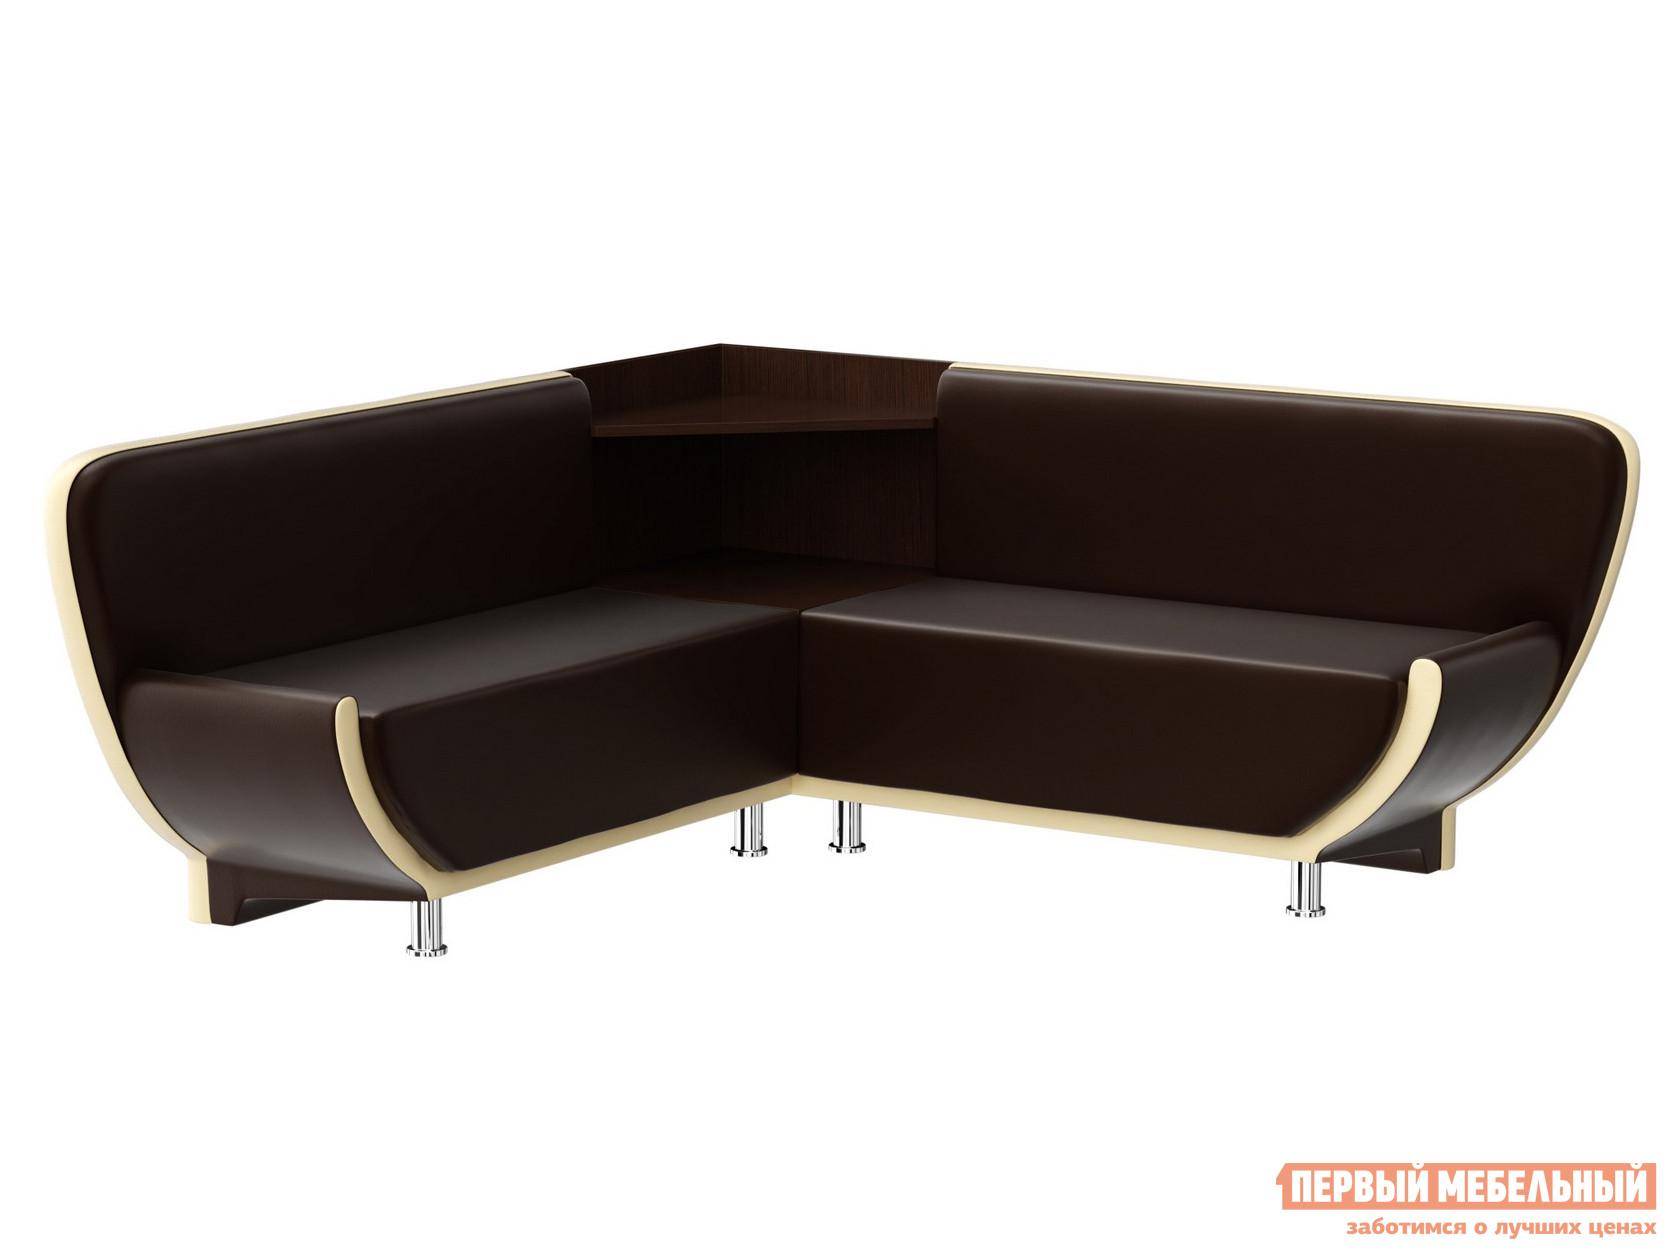 Кухонный угловой диван Мебелико Кухонный угловой диван Лотос